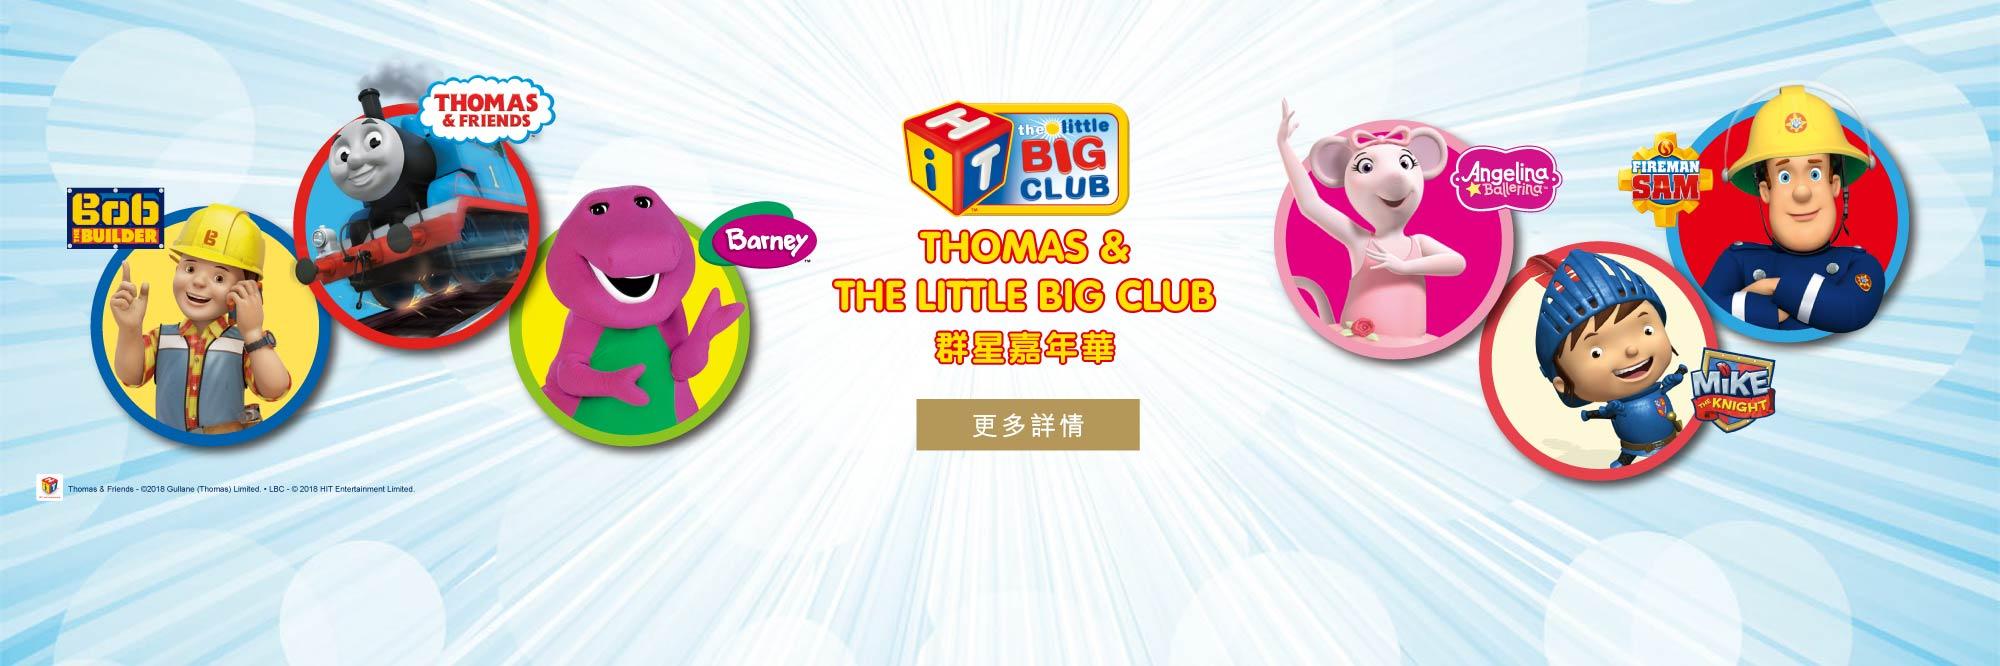 THOMAS & THE LITTLE BIG CLUB 群星嘉年華